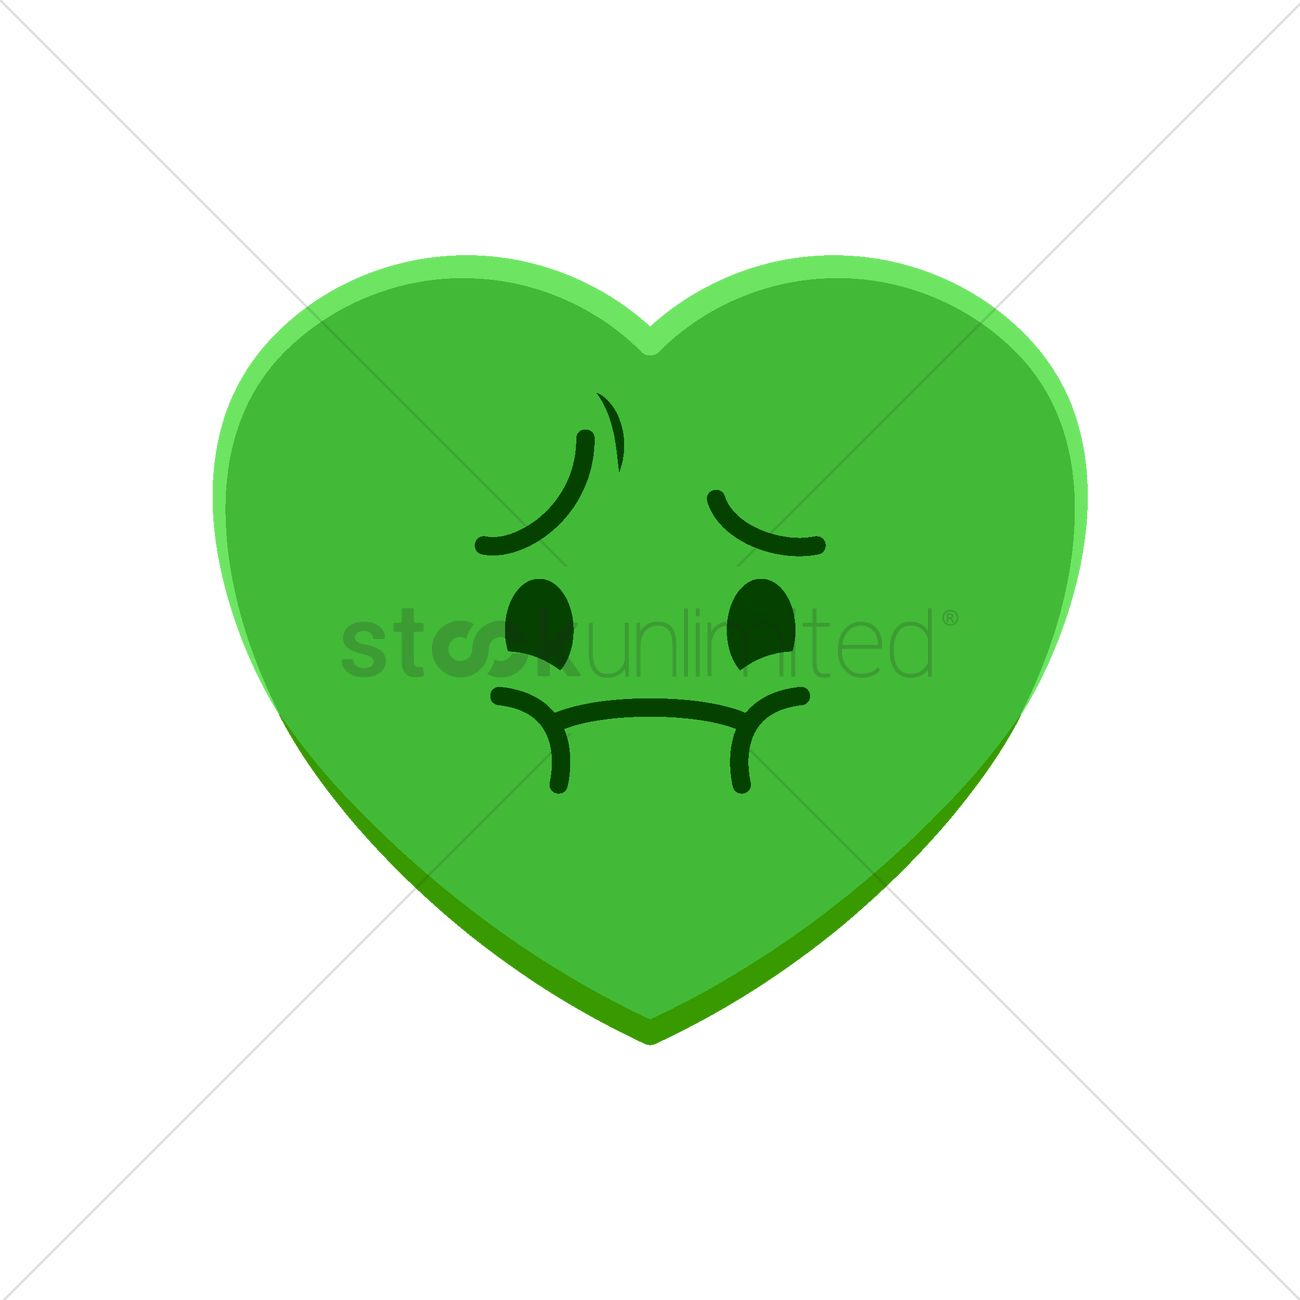 Heart Character Feeling Nausea Vector Image 1977534 Stockunlimited